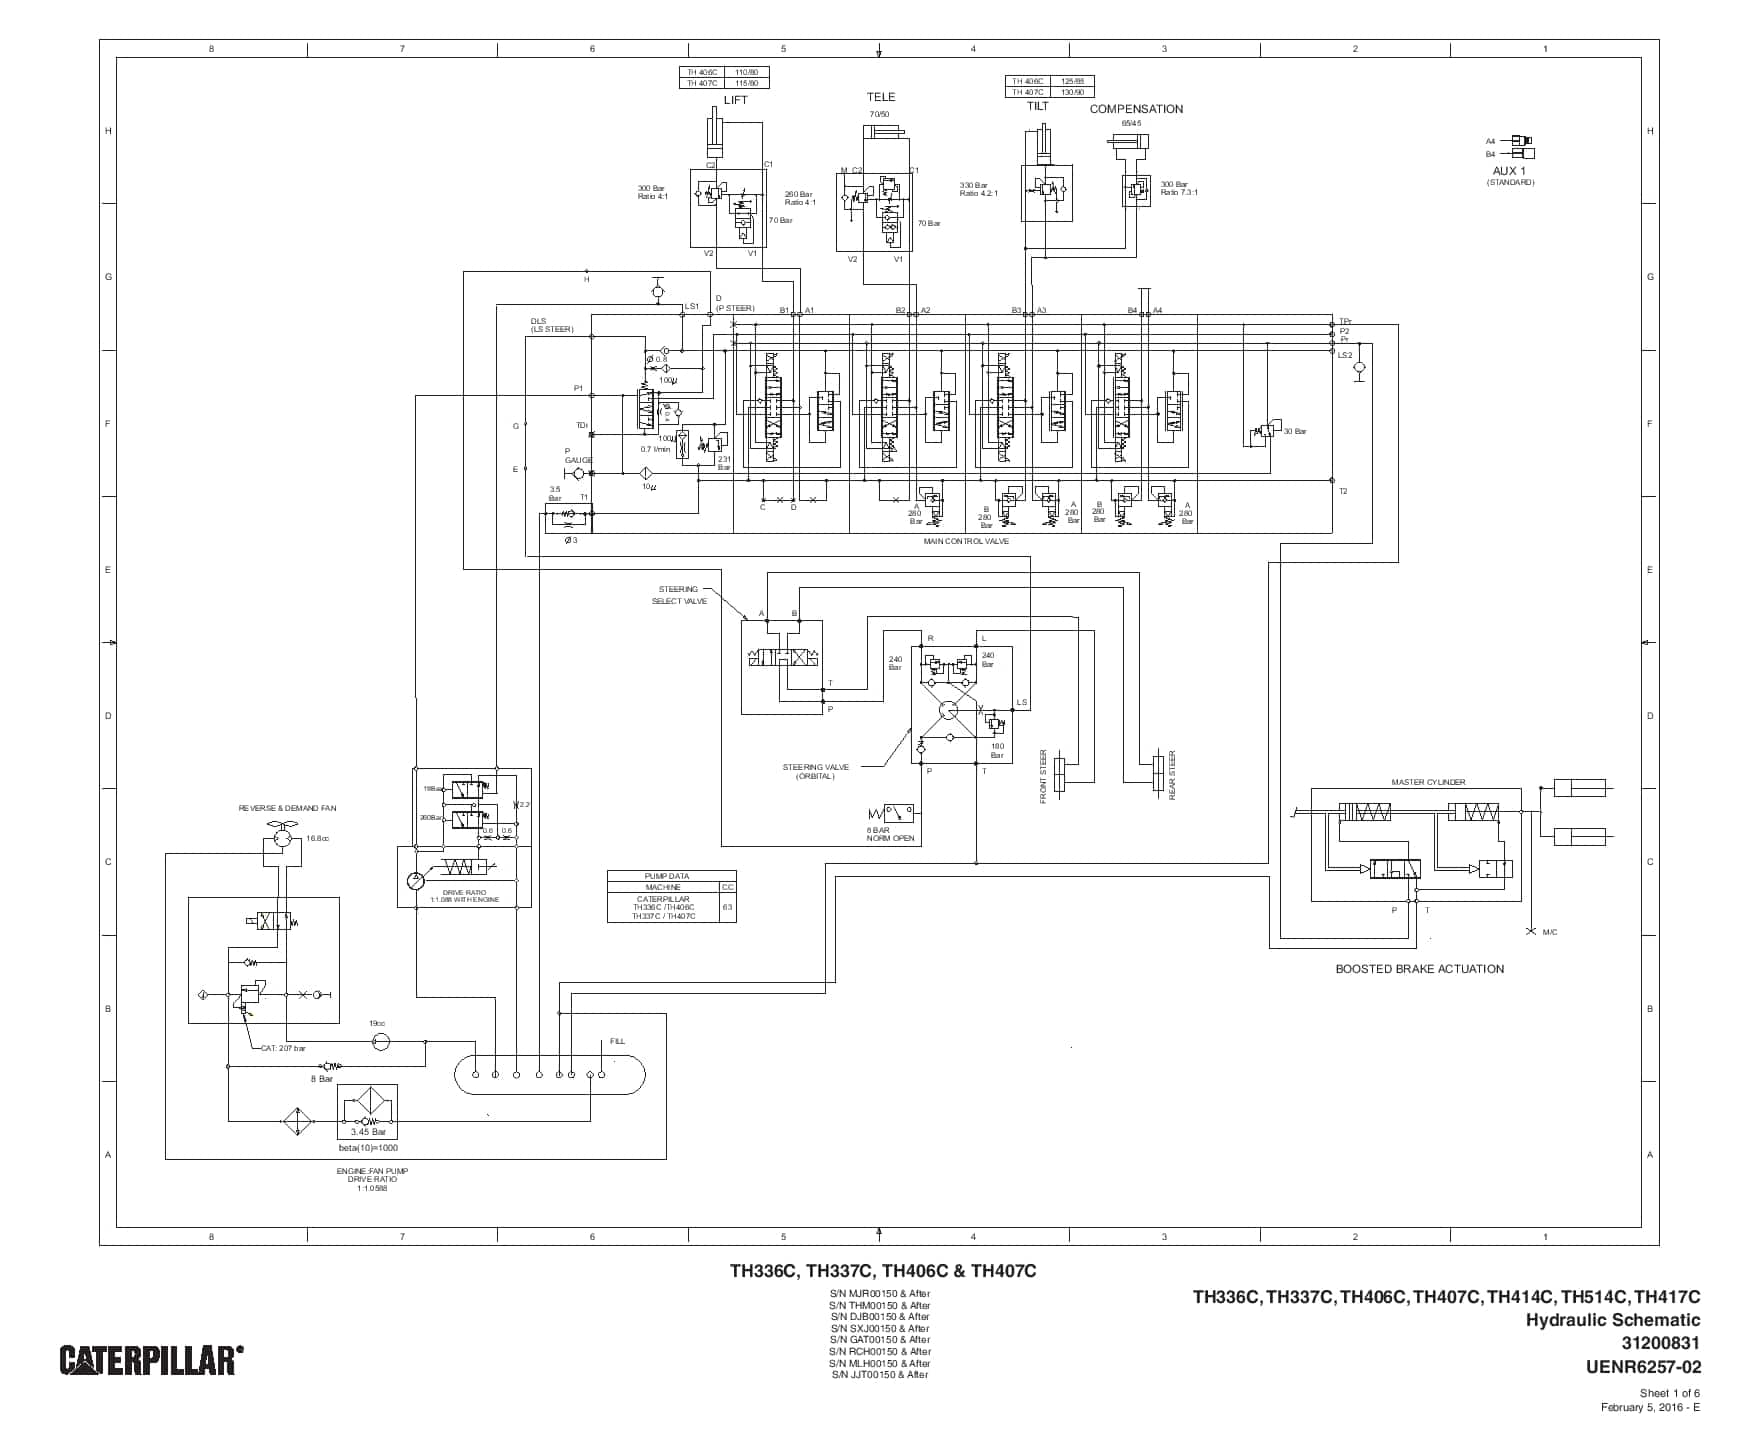 diagram] cat telehandler service manual hydraulic diagram -  inlot.carpenteriacassani.it  diagram